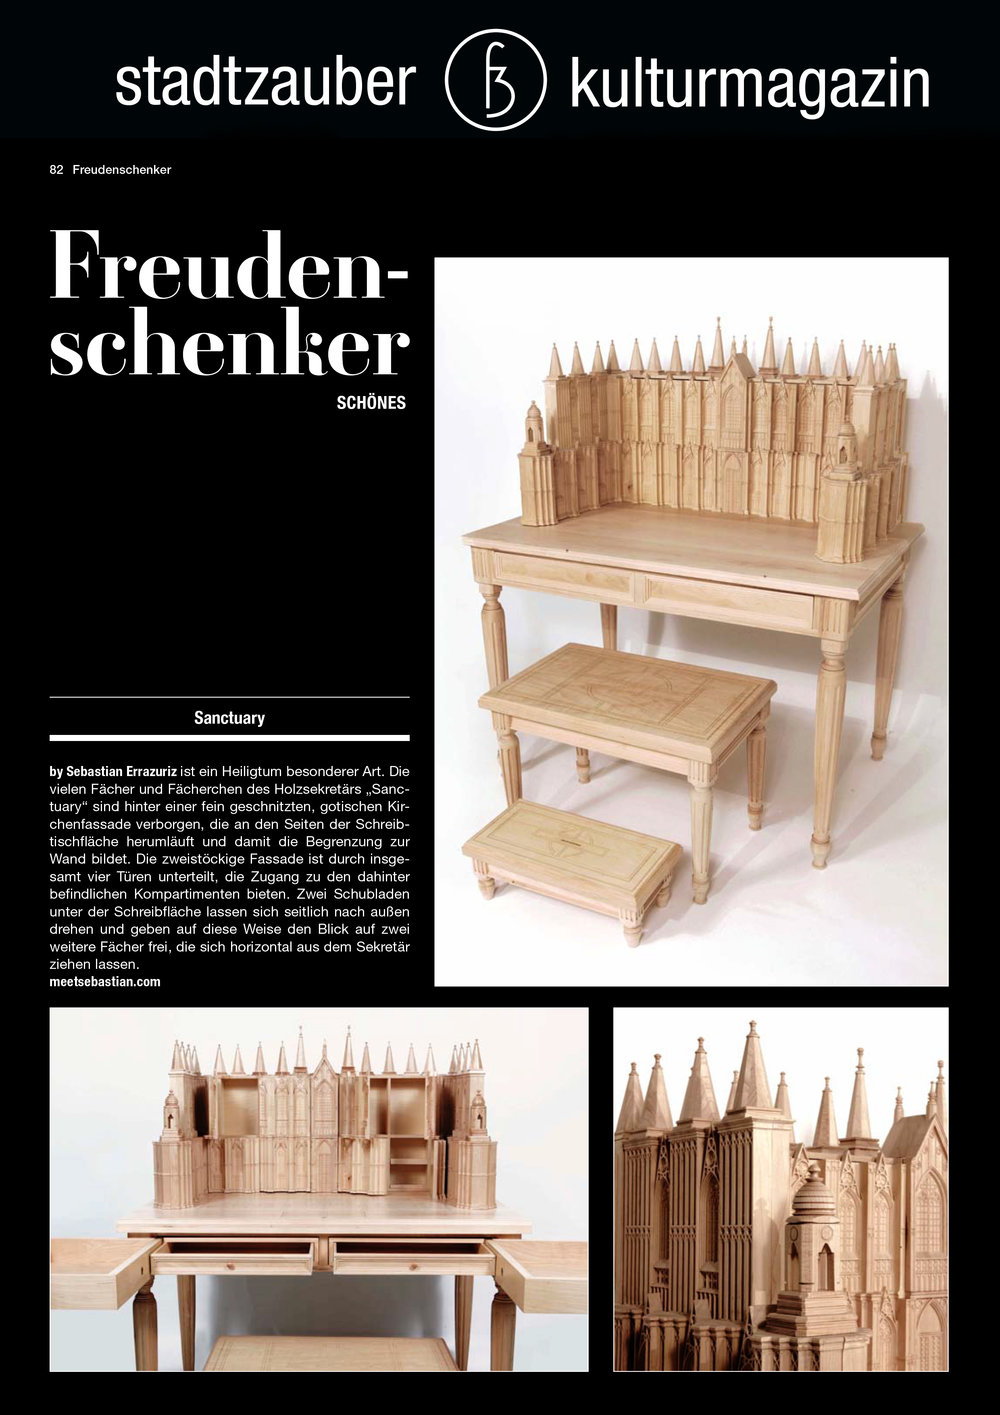 stadtzauber_kulturmagazin_2016.jpg